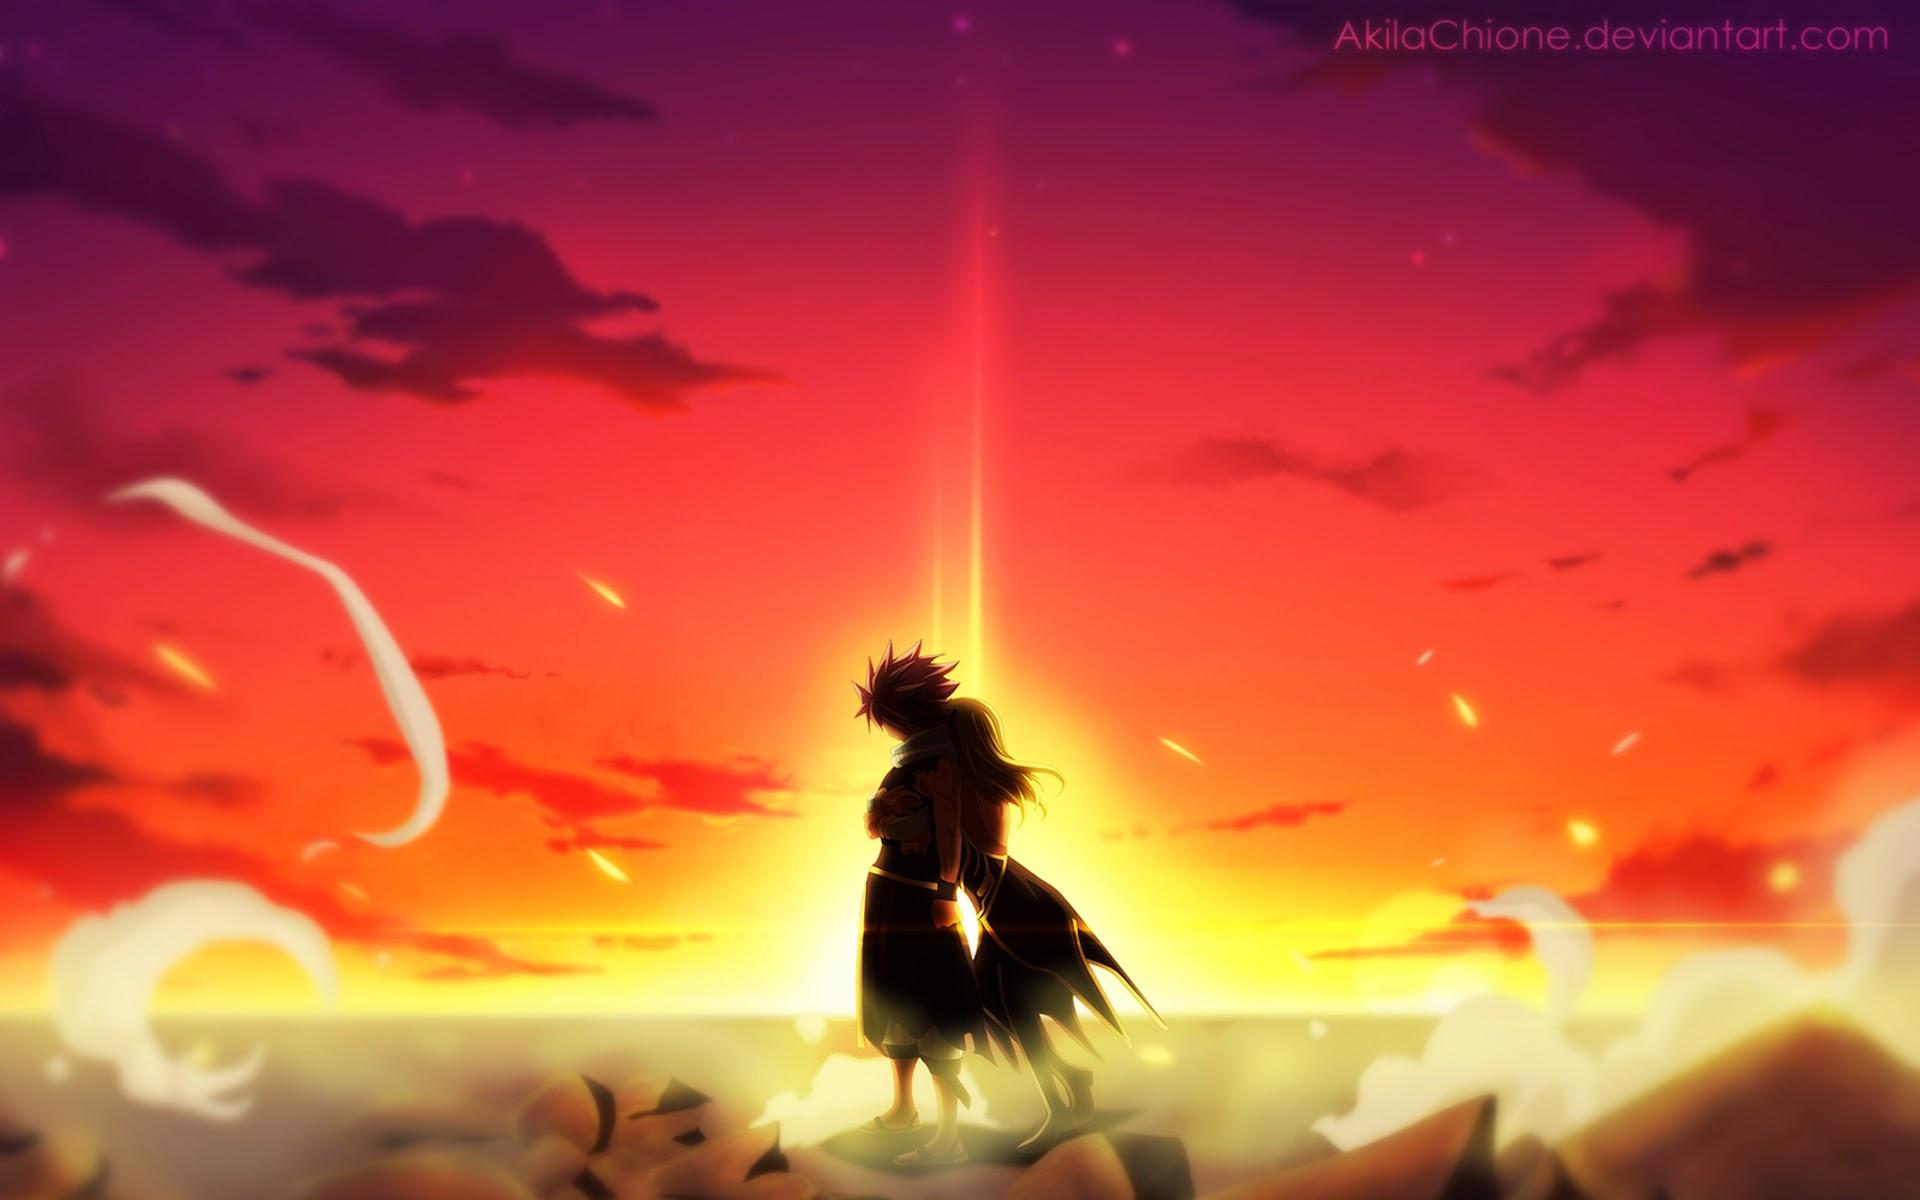 natsu dragneel and lucy heartfilia fairy tail anime hd wallpaper 1920x1200